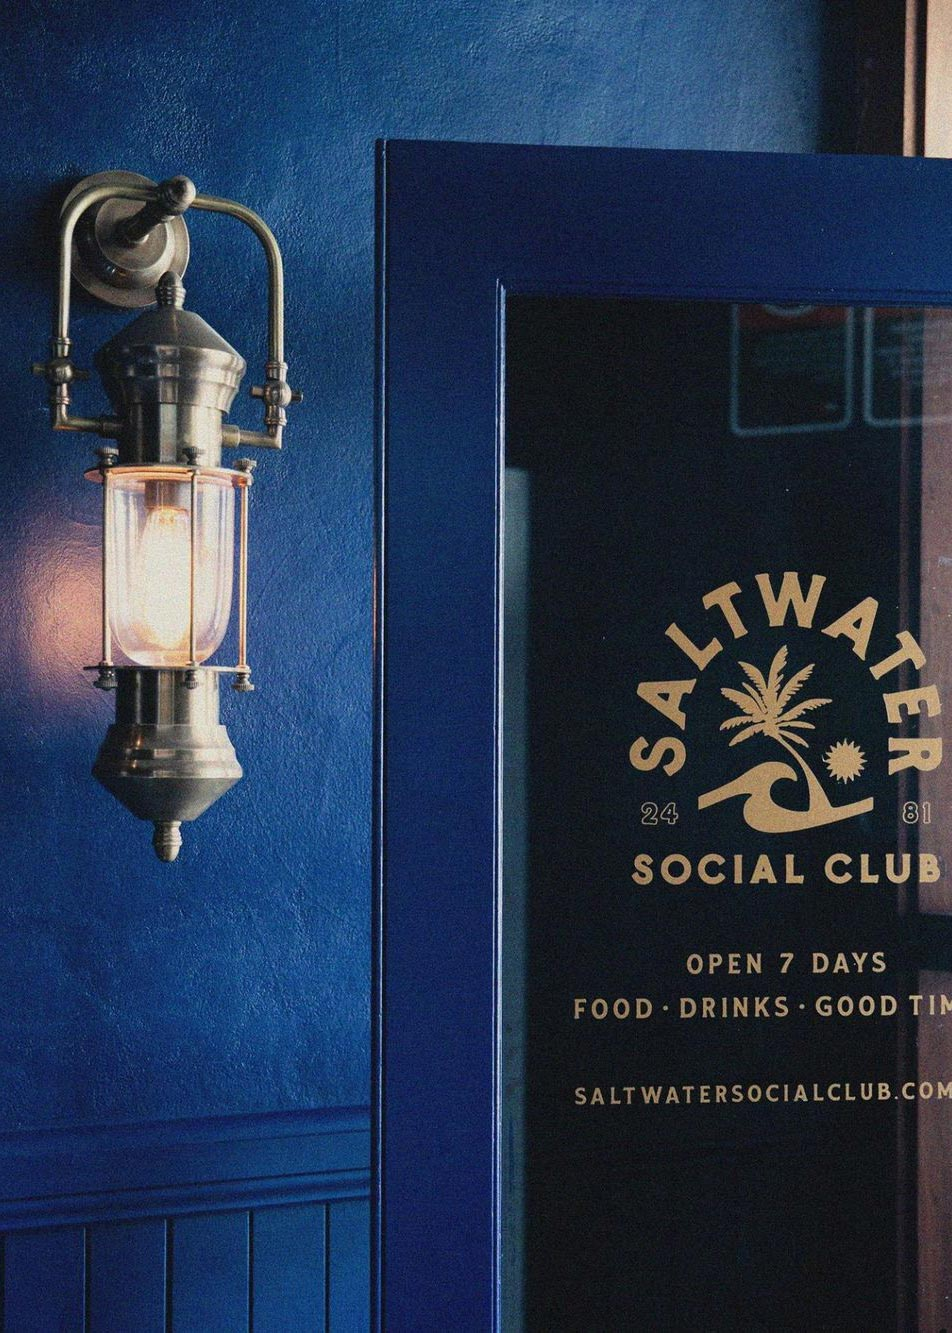 Saltwater Social Club